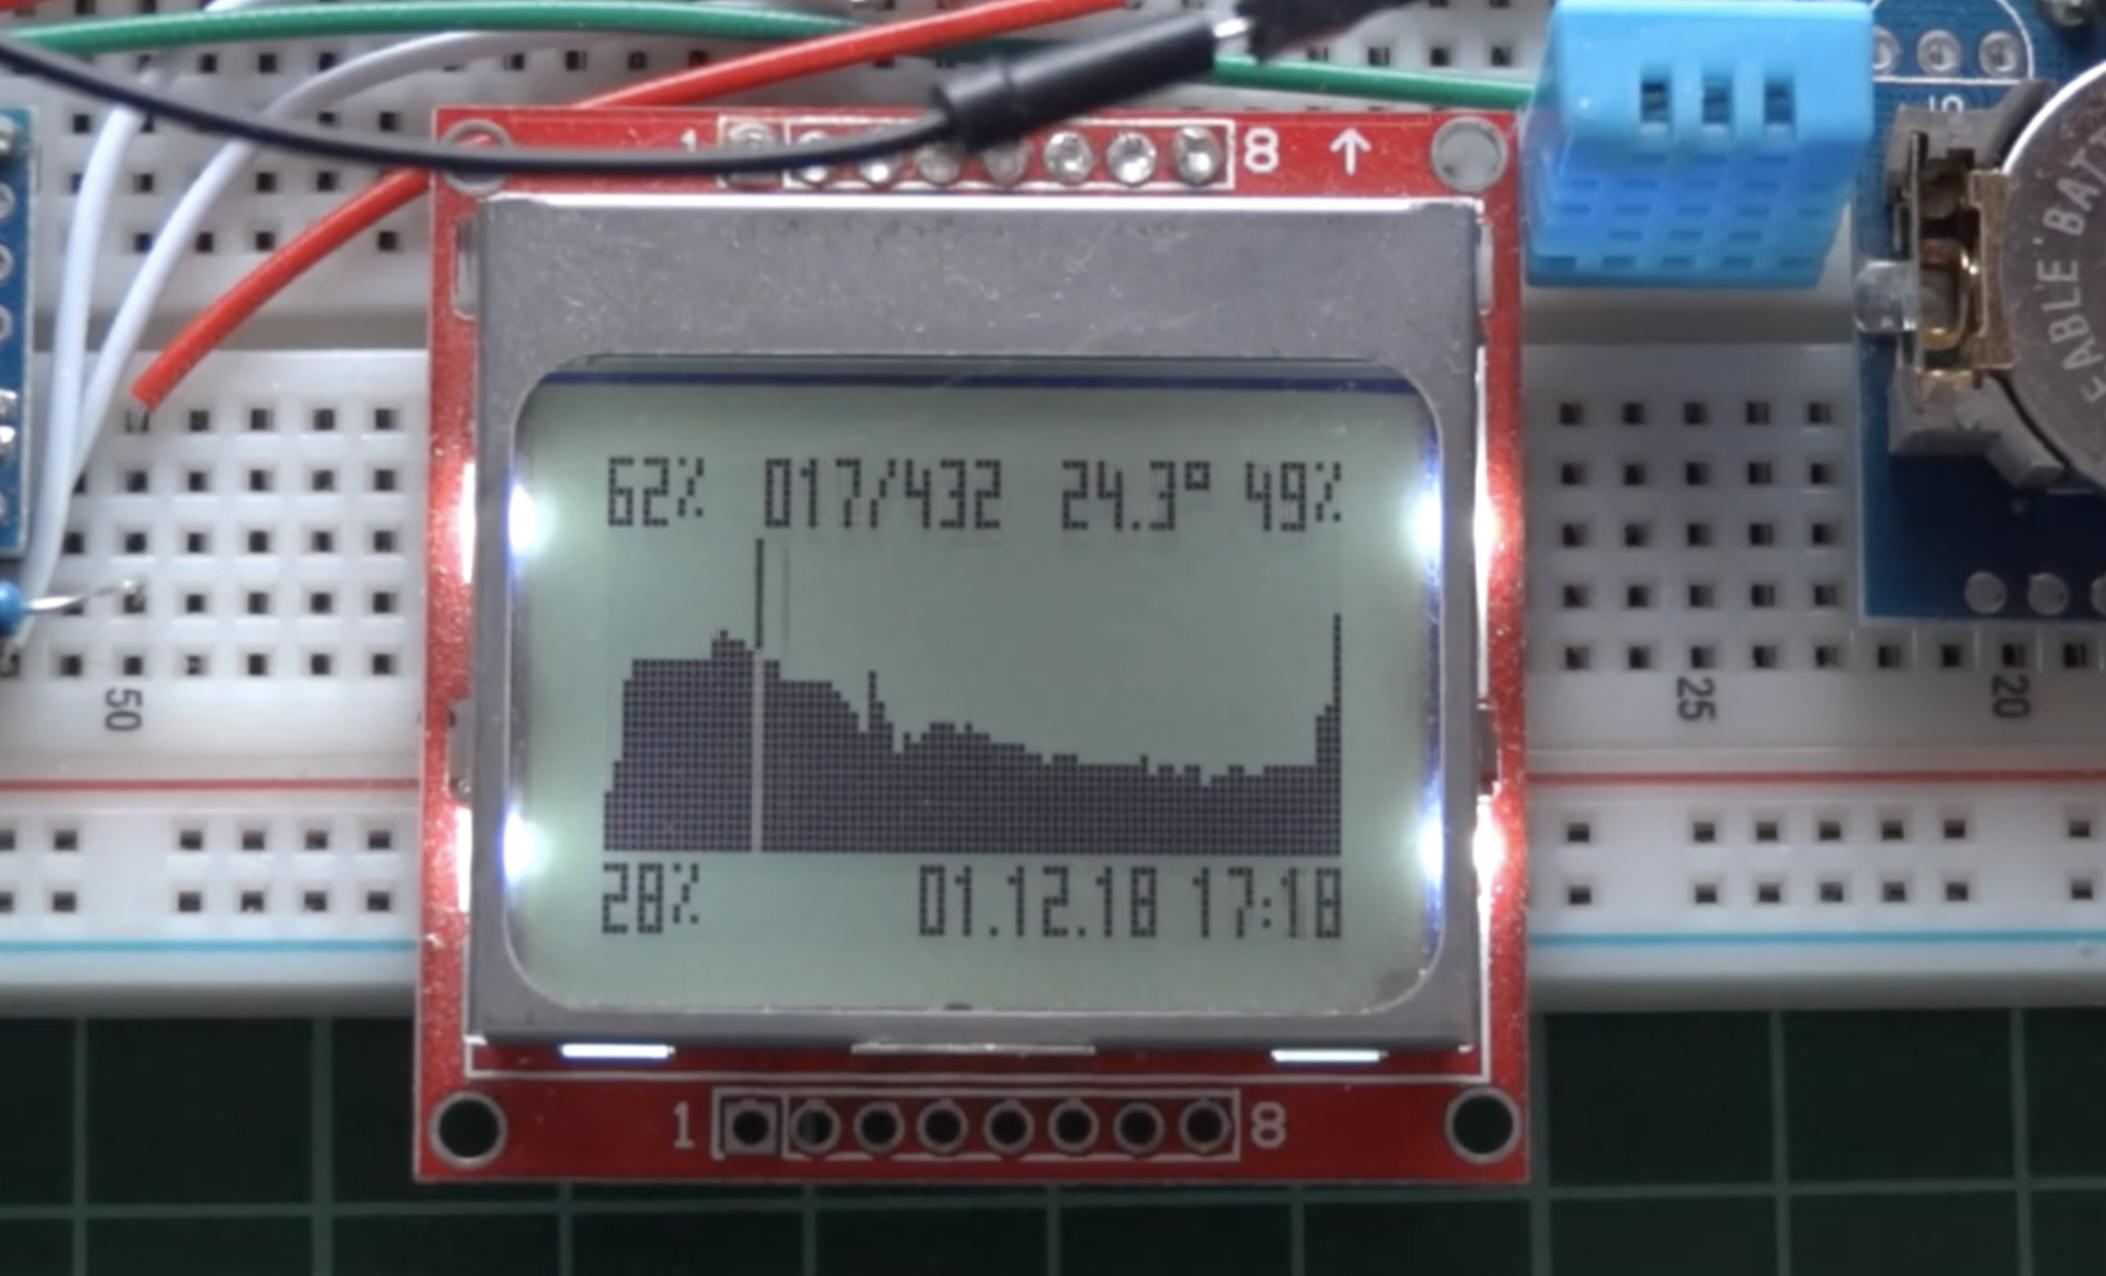 Nokia 5110 LCD based Arduino Datalogger with Menu